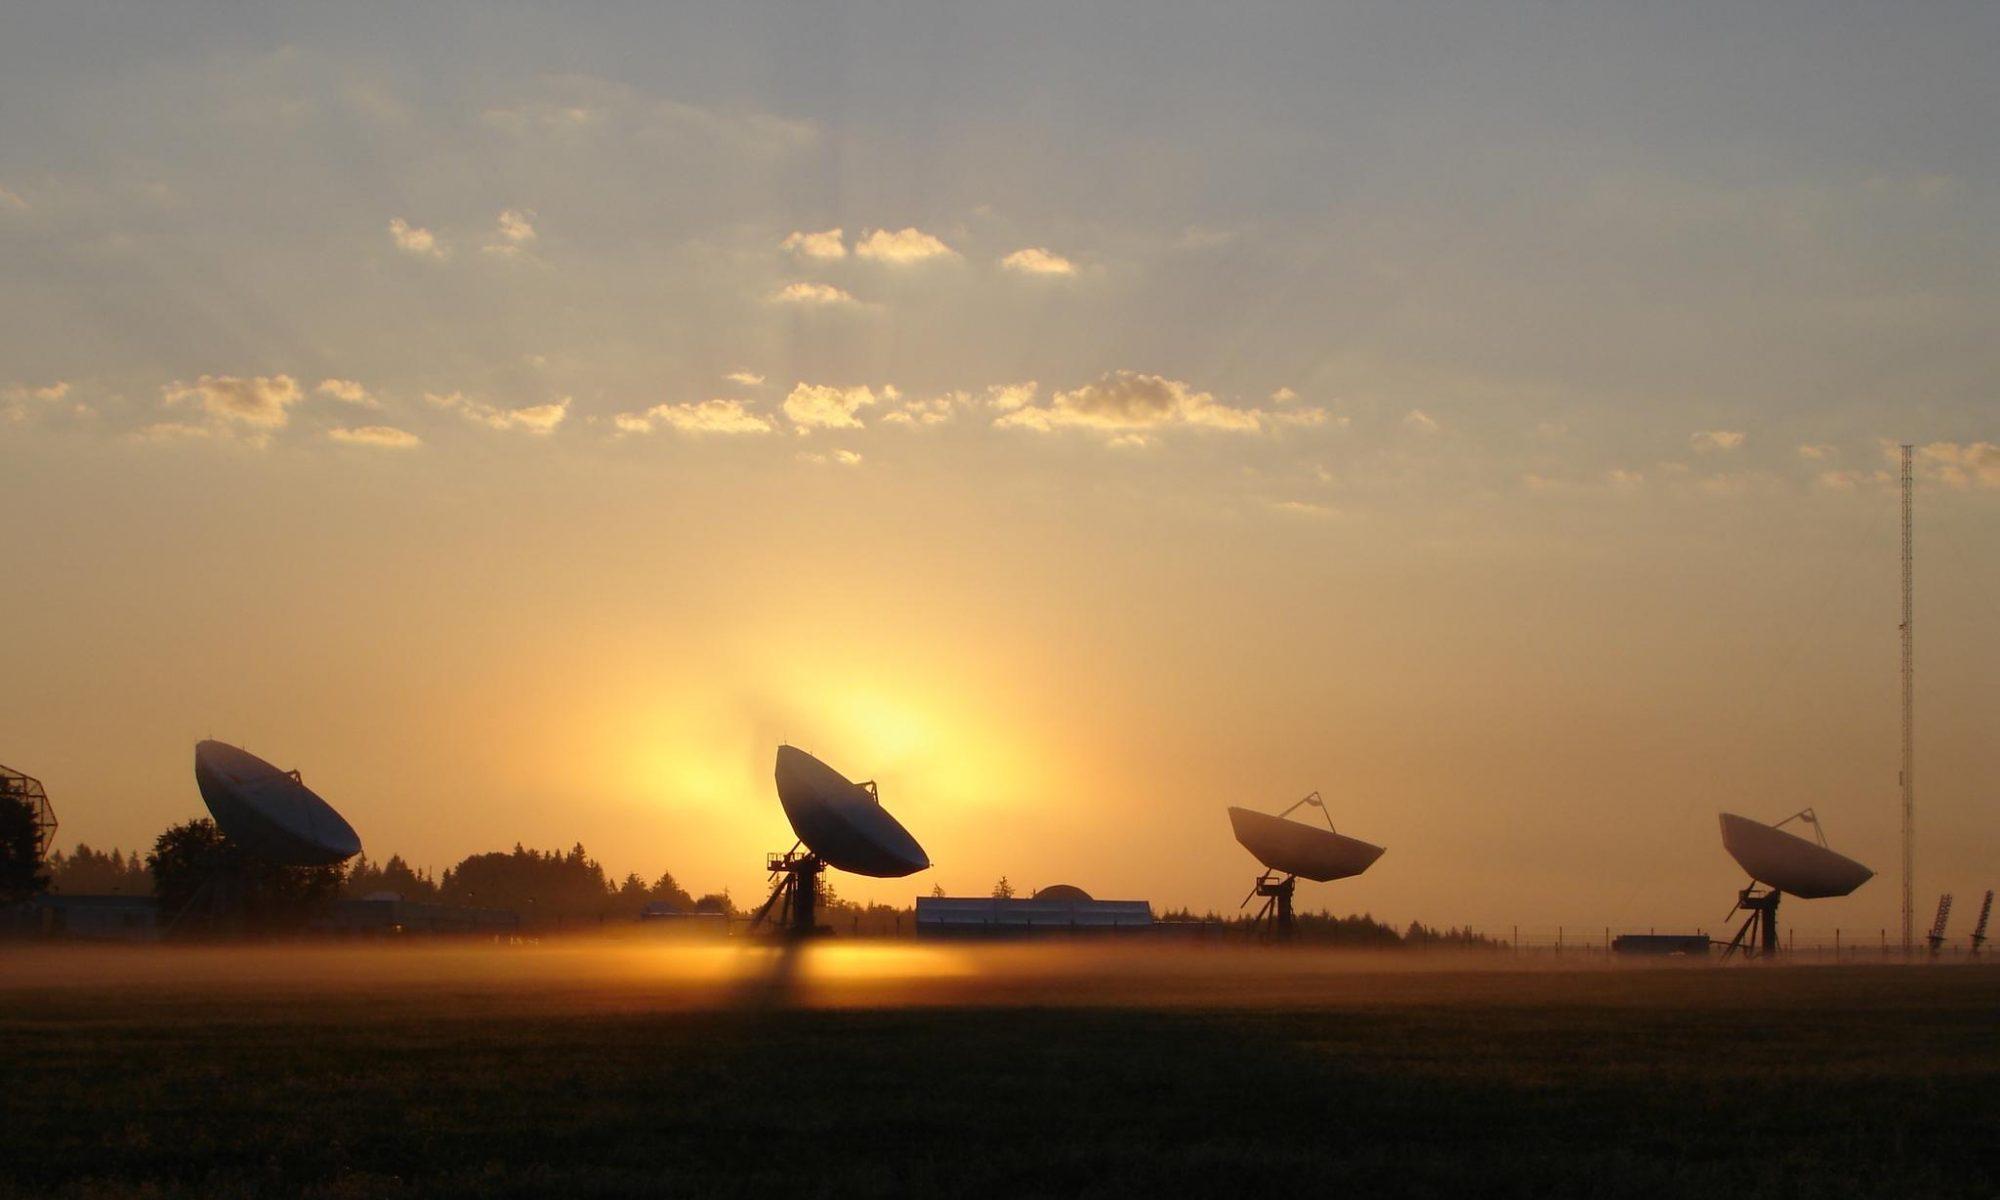 Спутниковый телепорт / teleport satellite